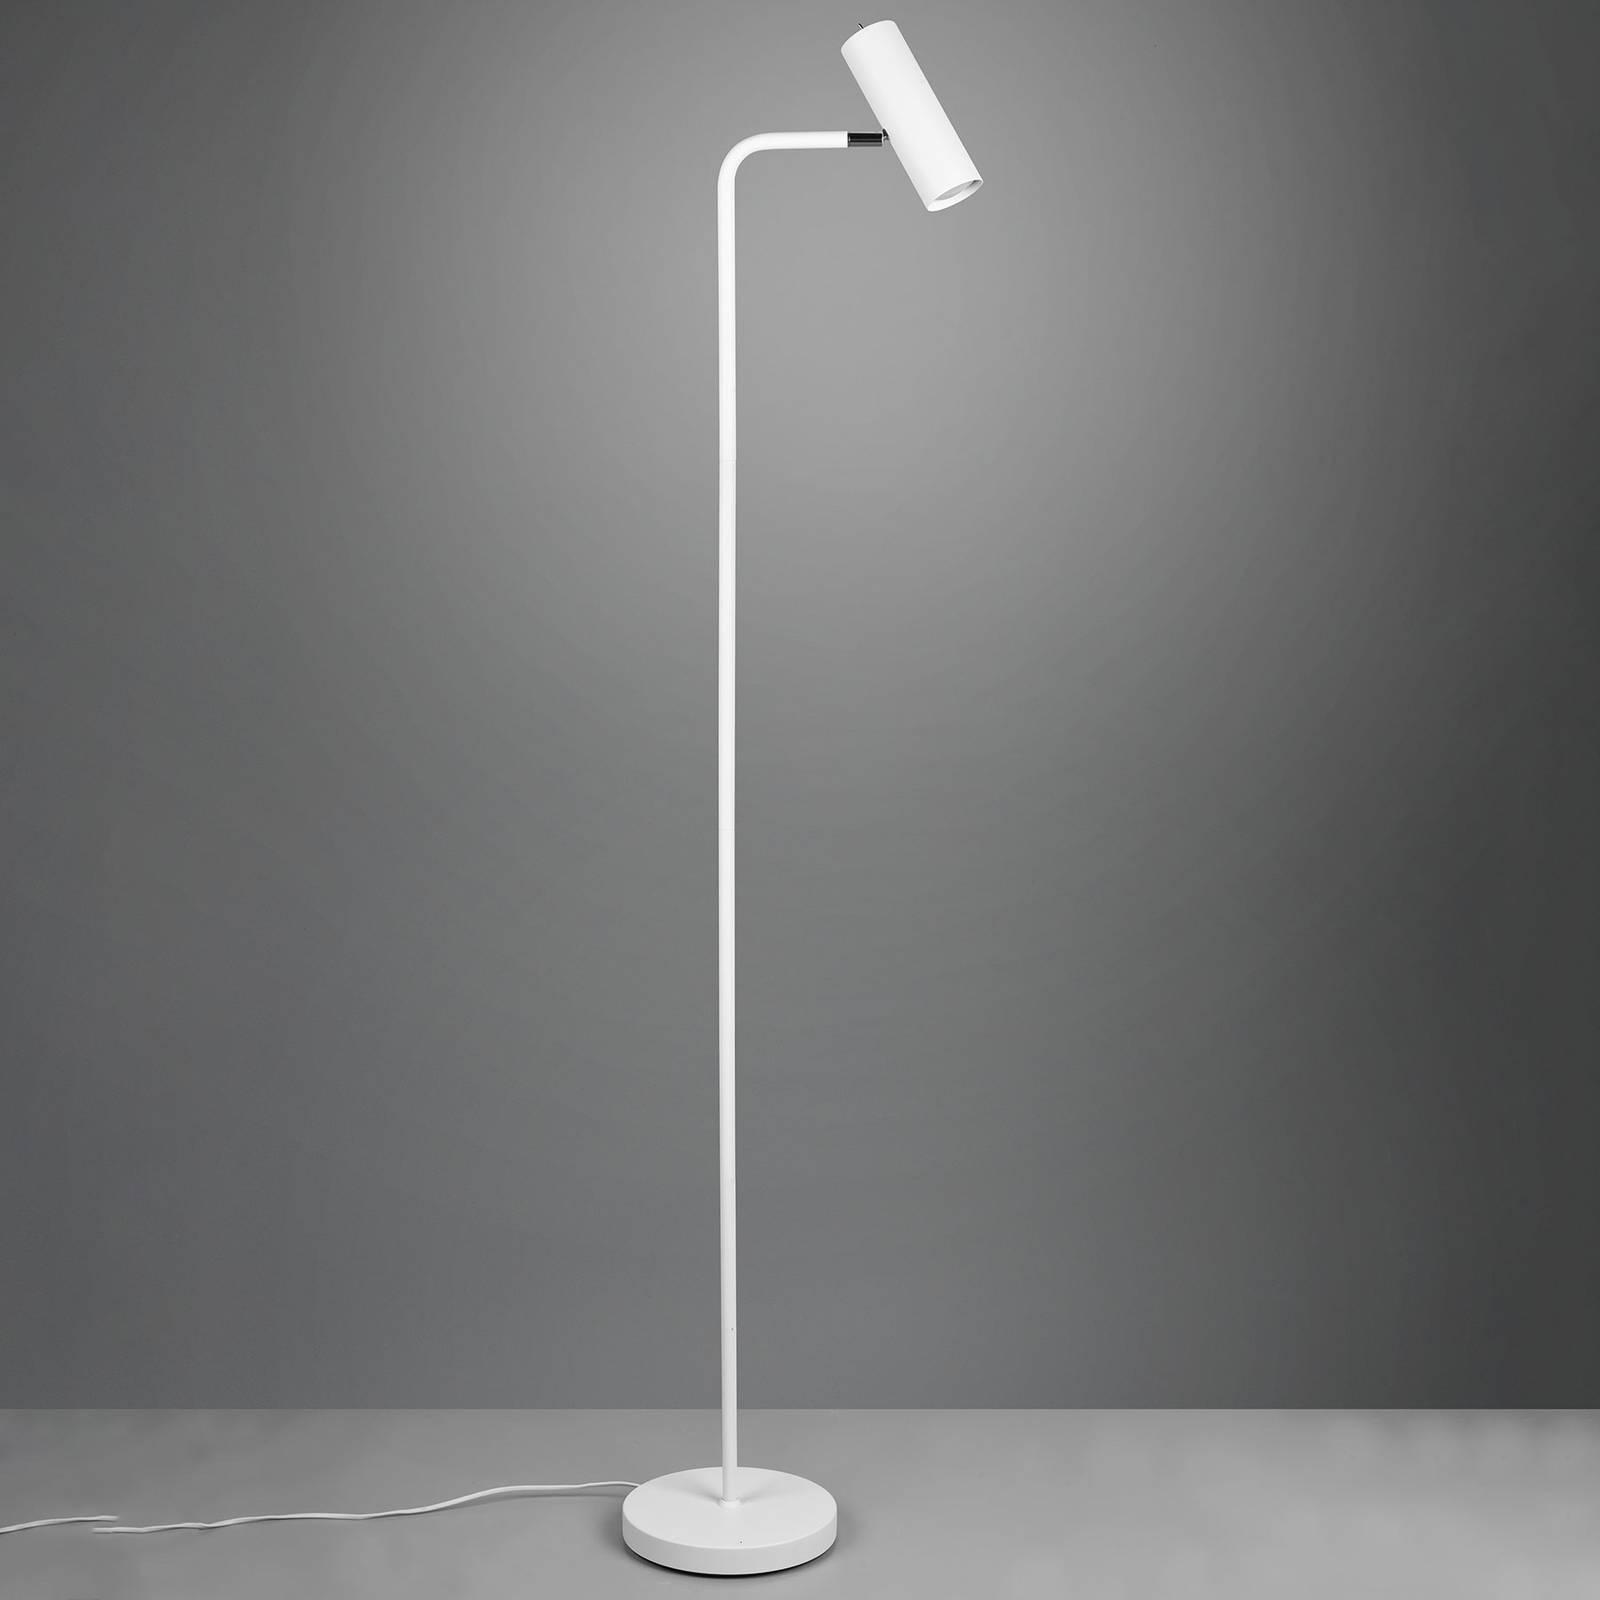 Vloerlamp Marley, mat wit